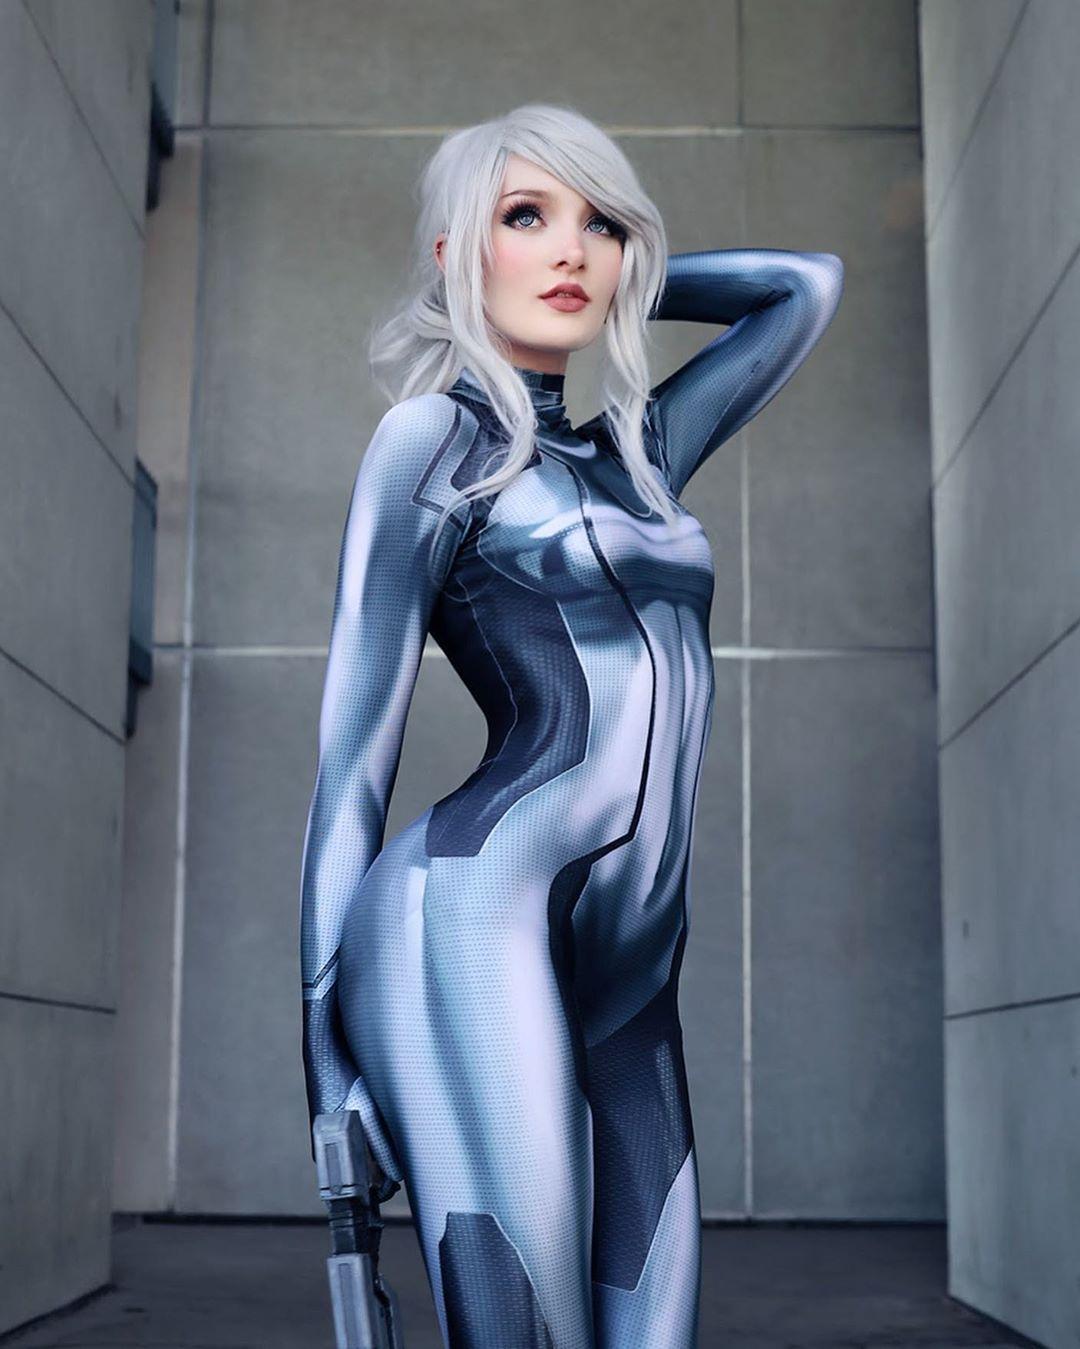 Dark Samus in Her Zero Suit cosplay by aniejoyyy